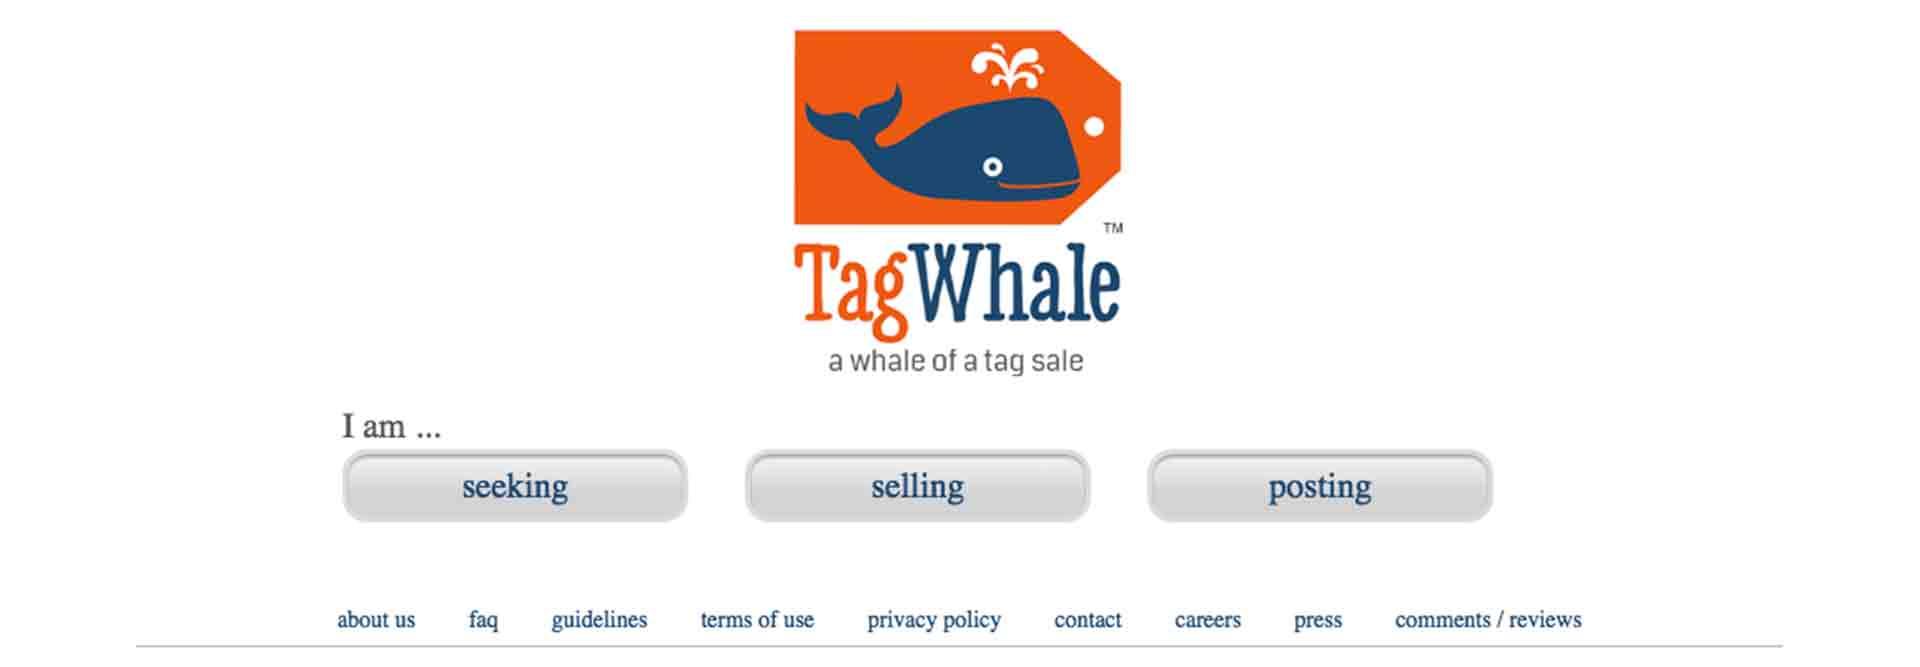 tagwhale